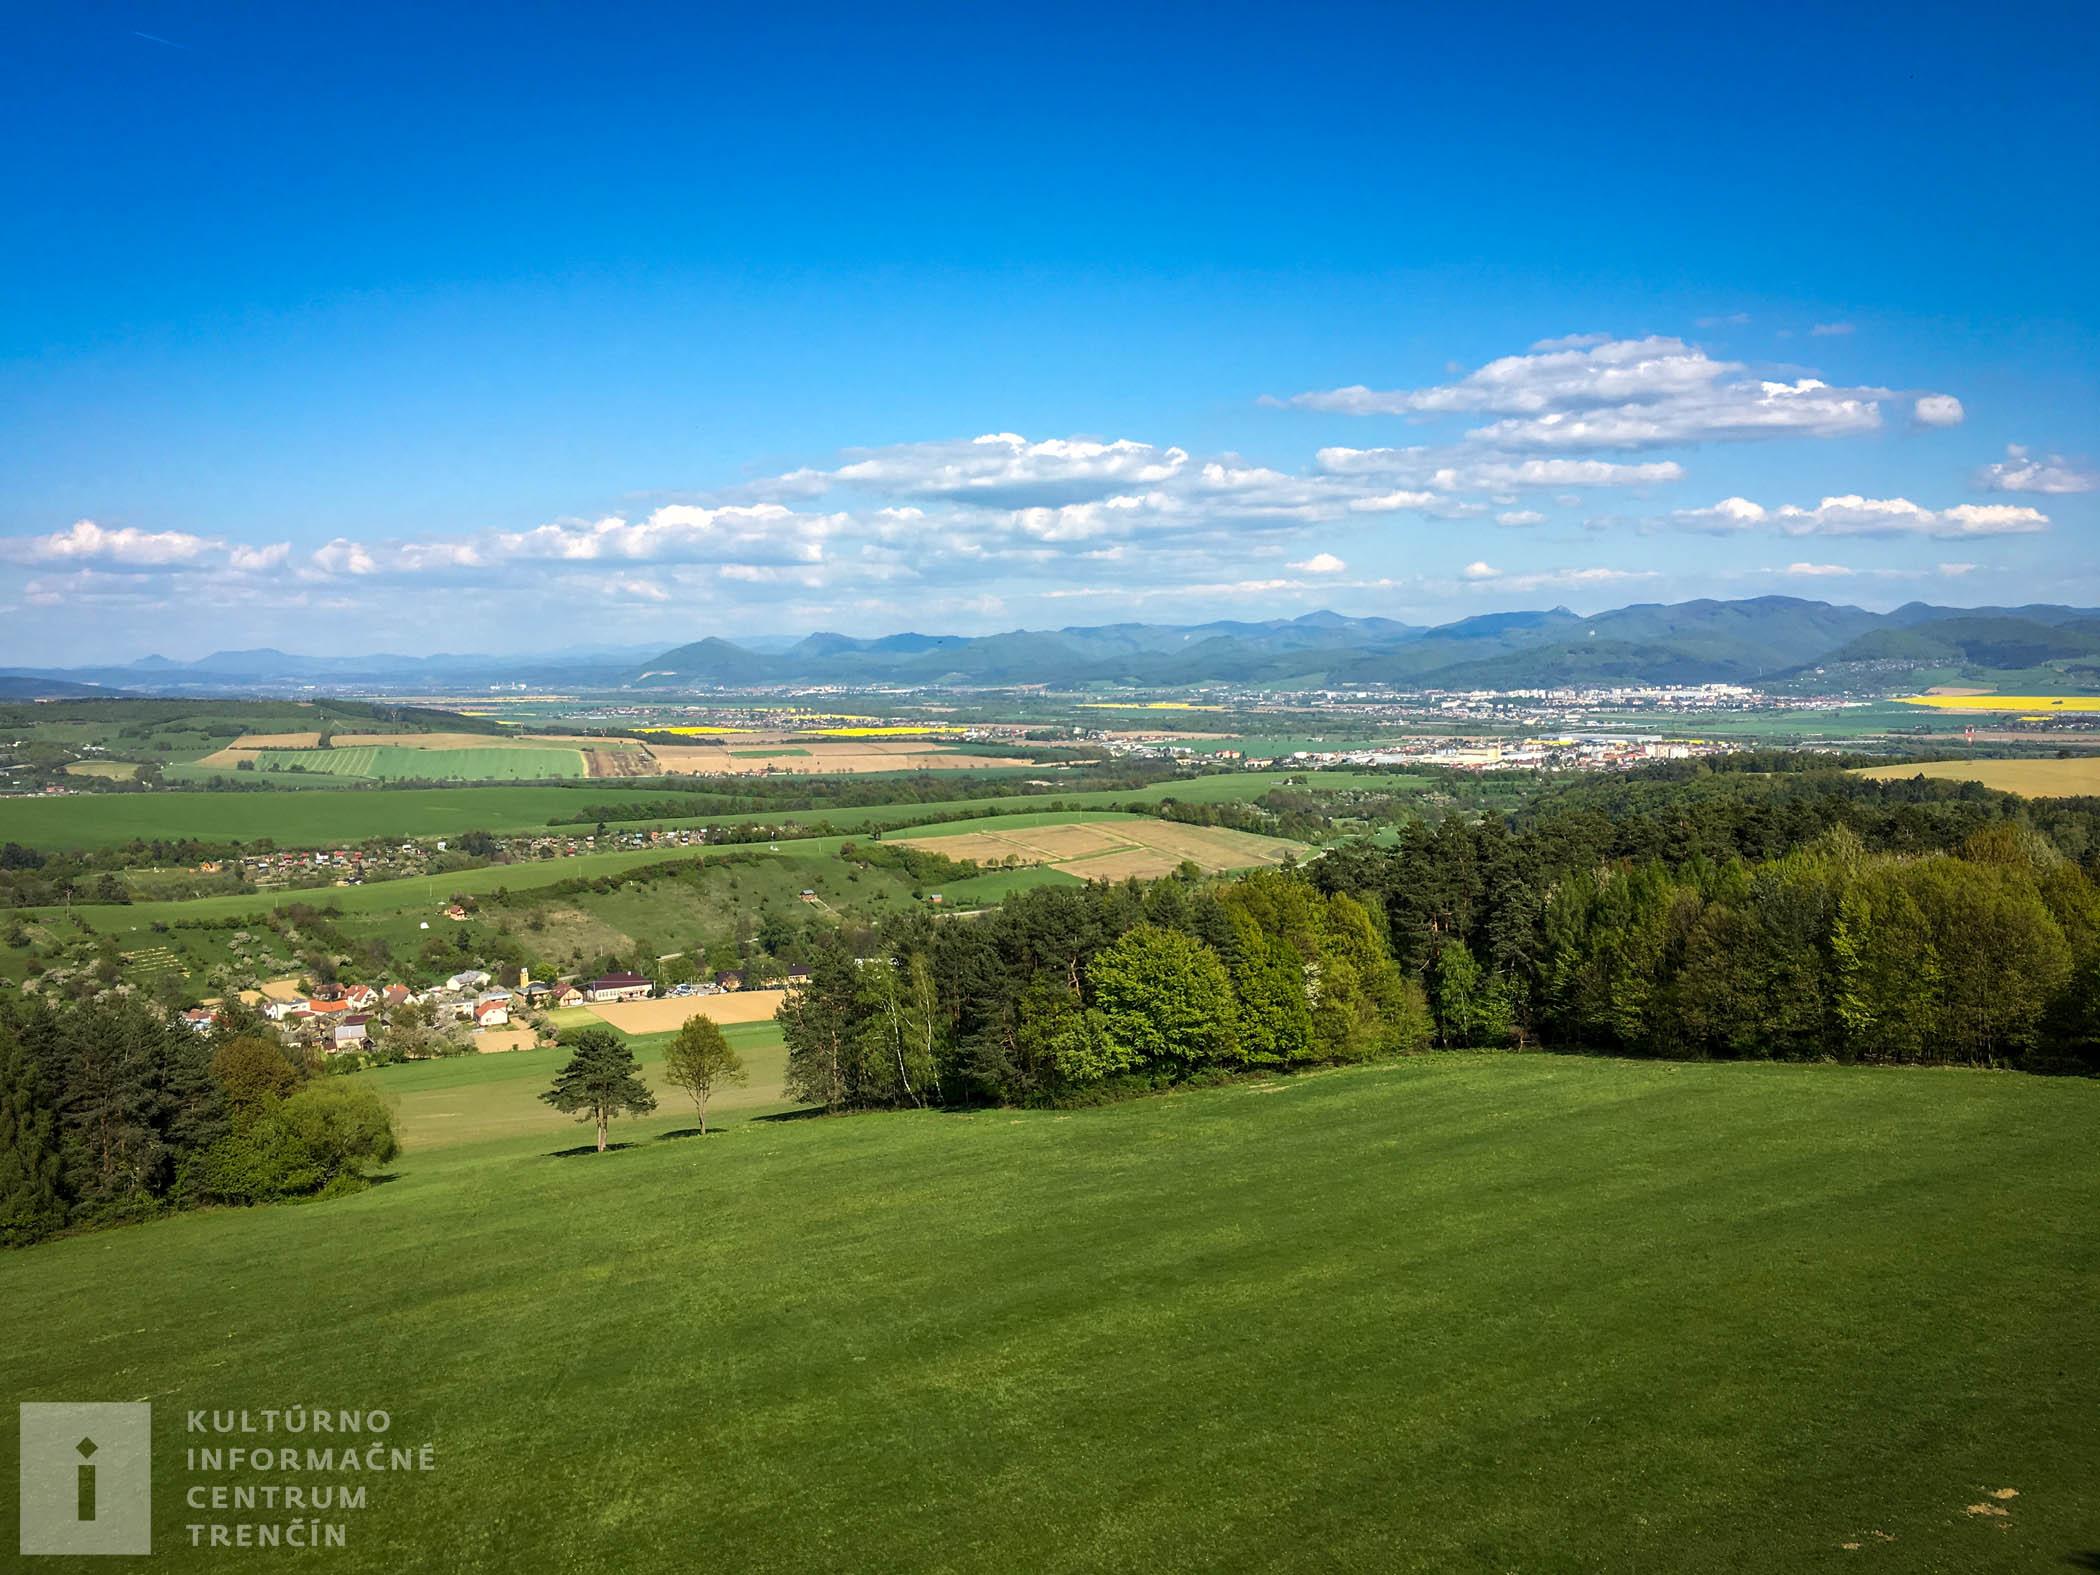 Výhľad z rozhľadne Malý Jelenec na blízke obce a mestá